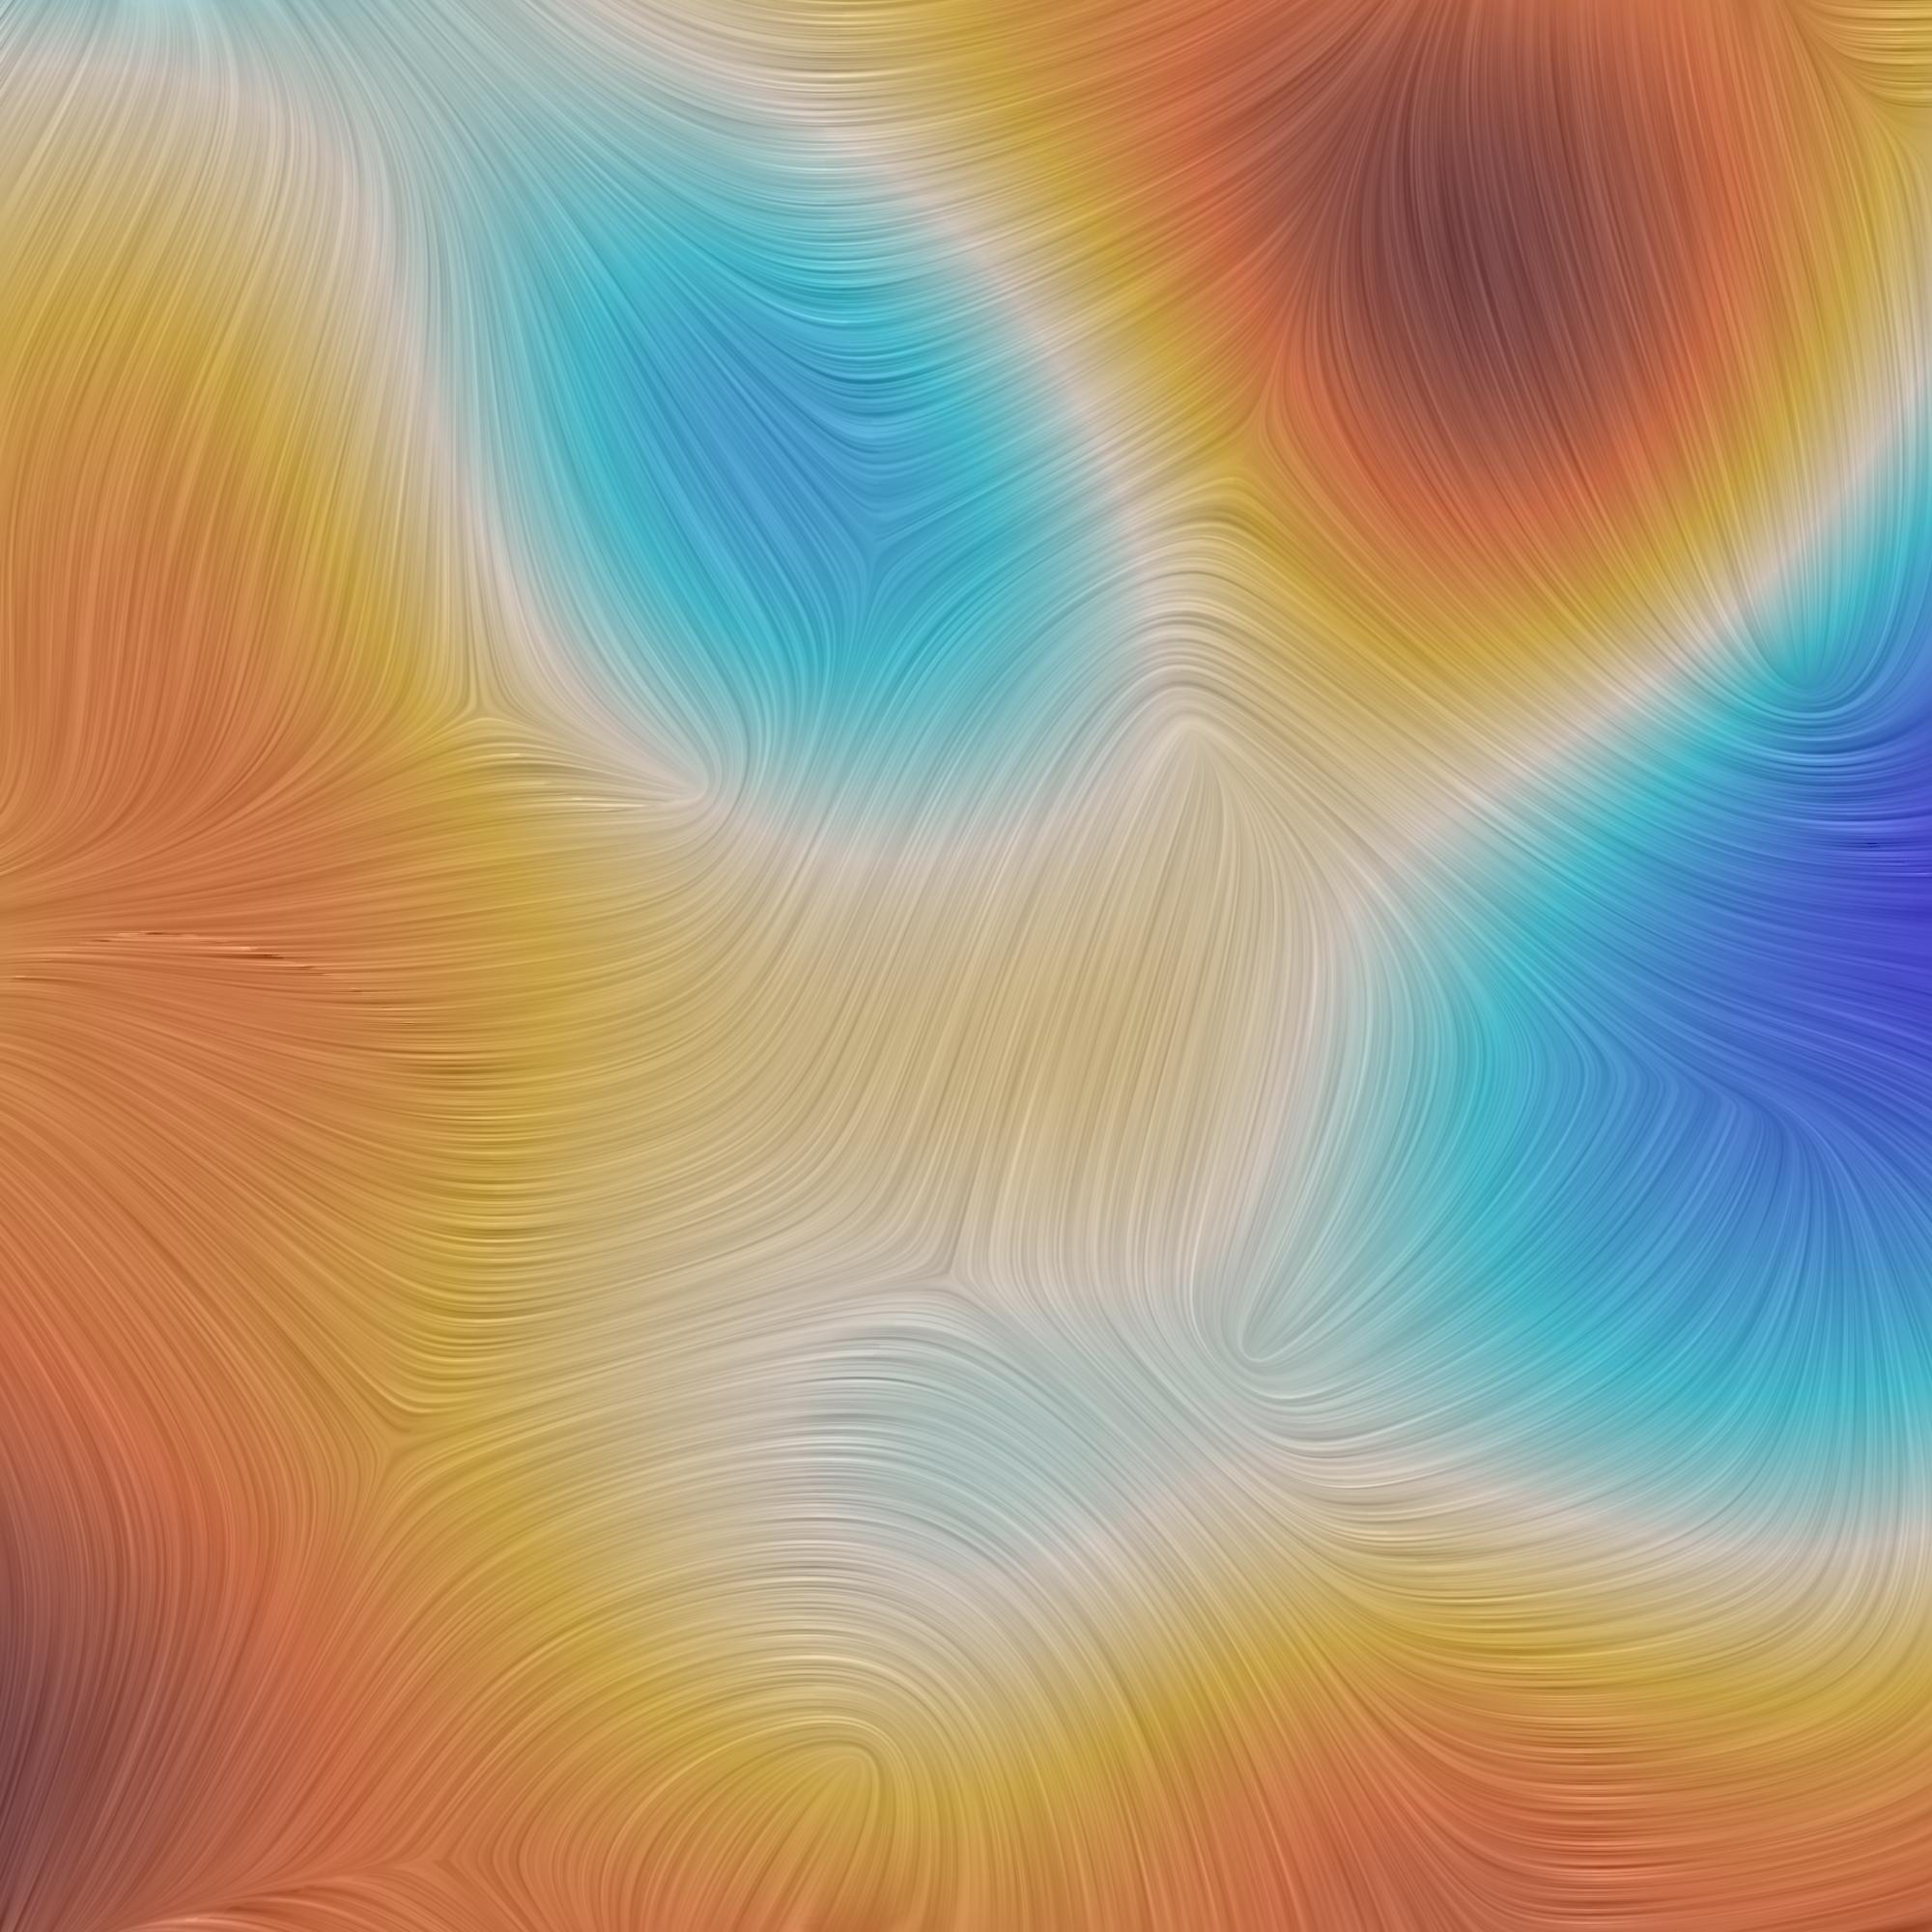 1567215914706-ESA_Planck_CMB_Polarisation_zoom_5deg.png